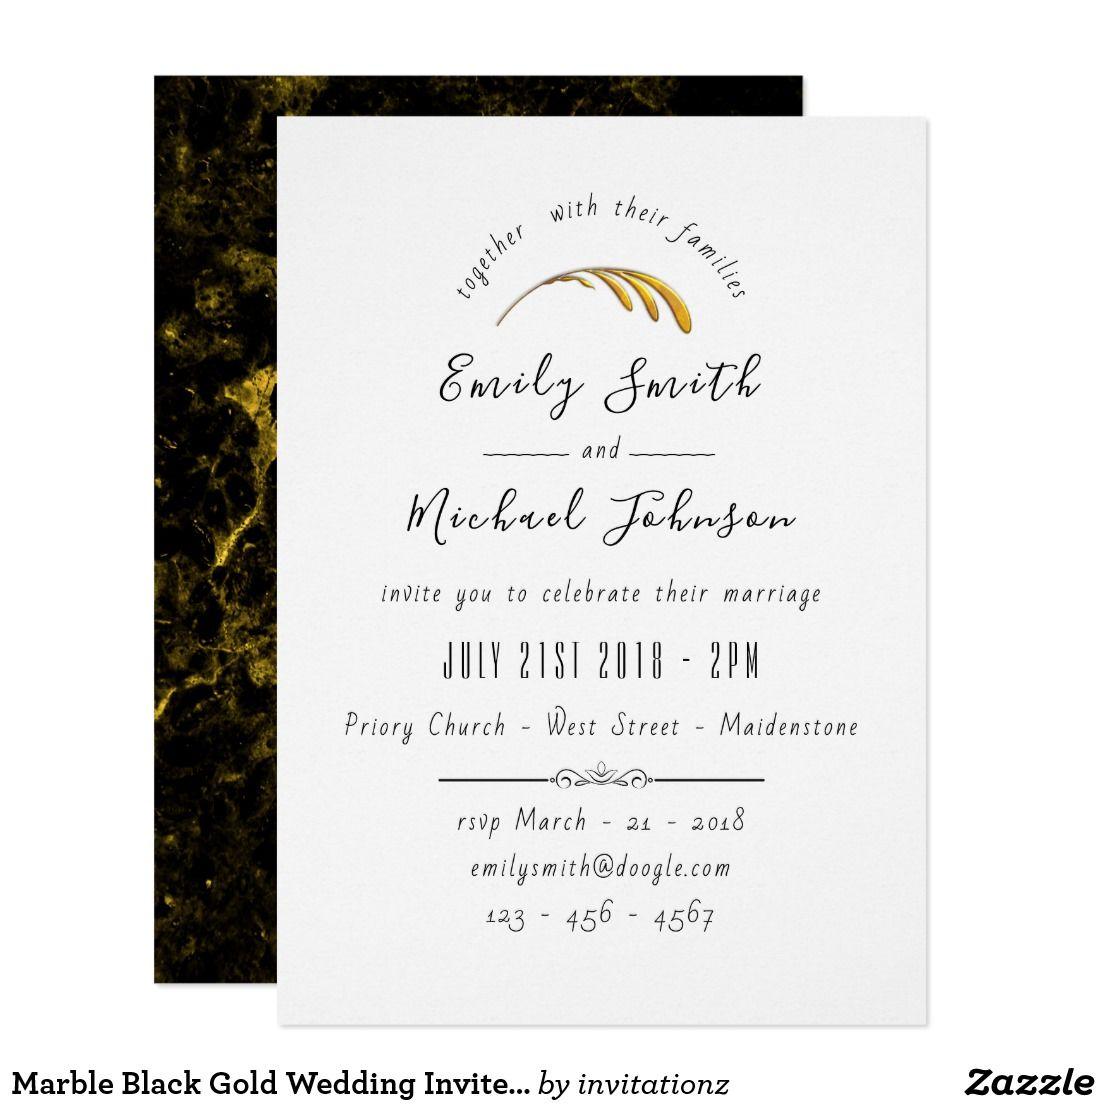 Marble Black Gold Wedding Invite Handwriting | Trending Wedding ...